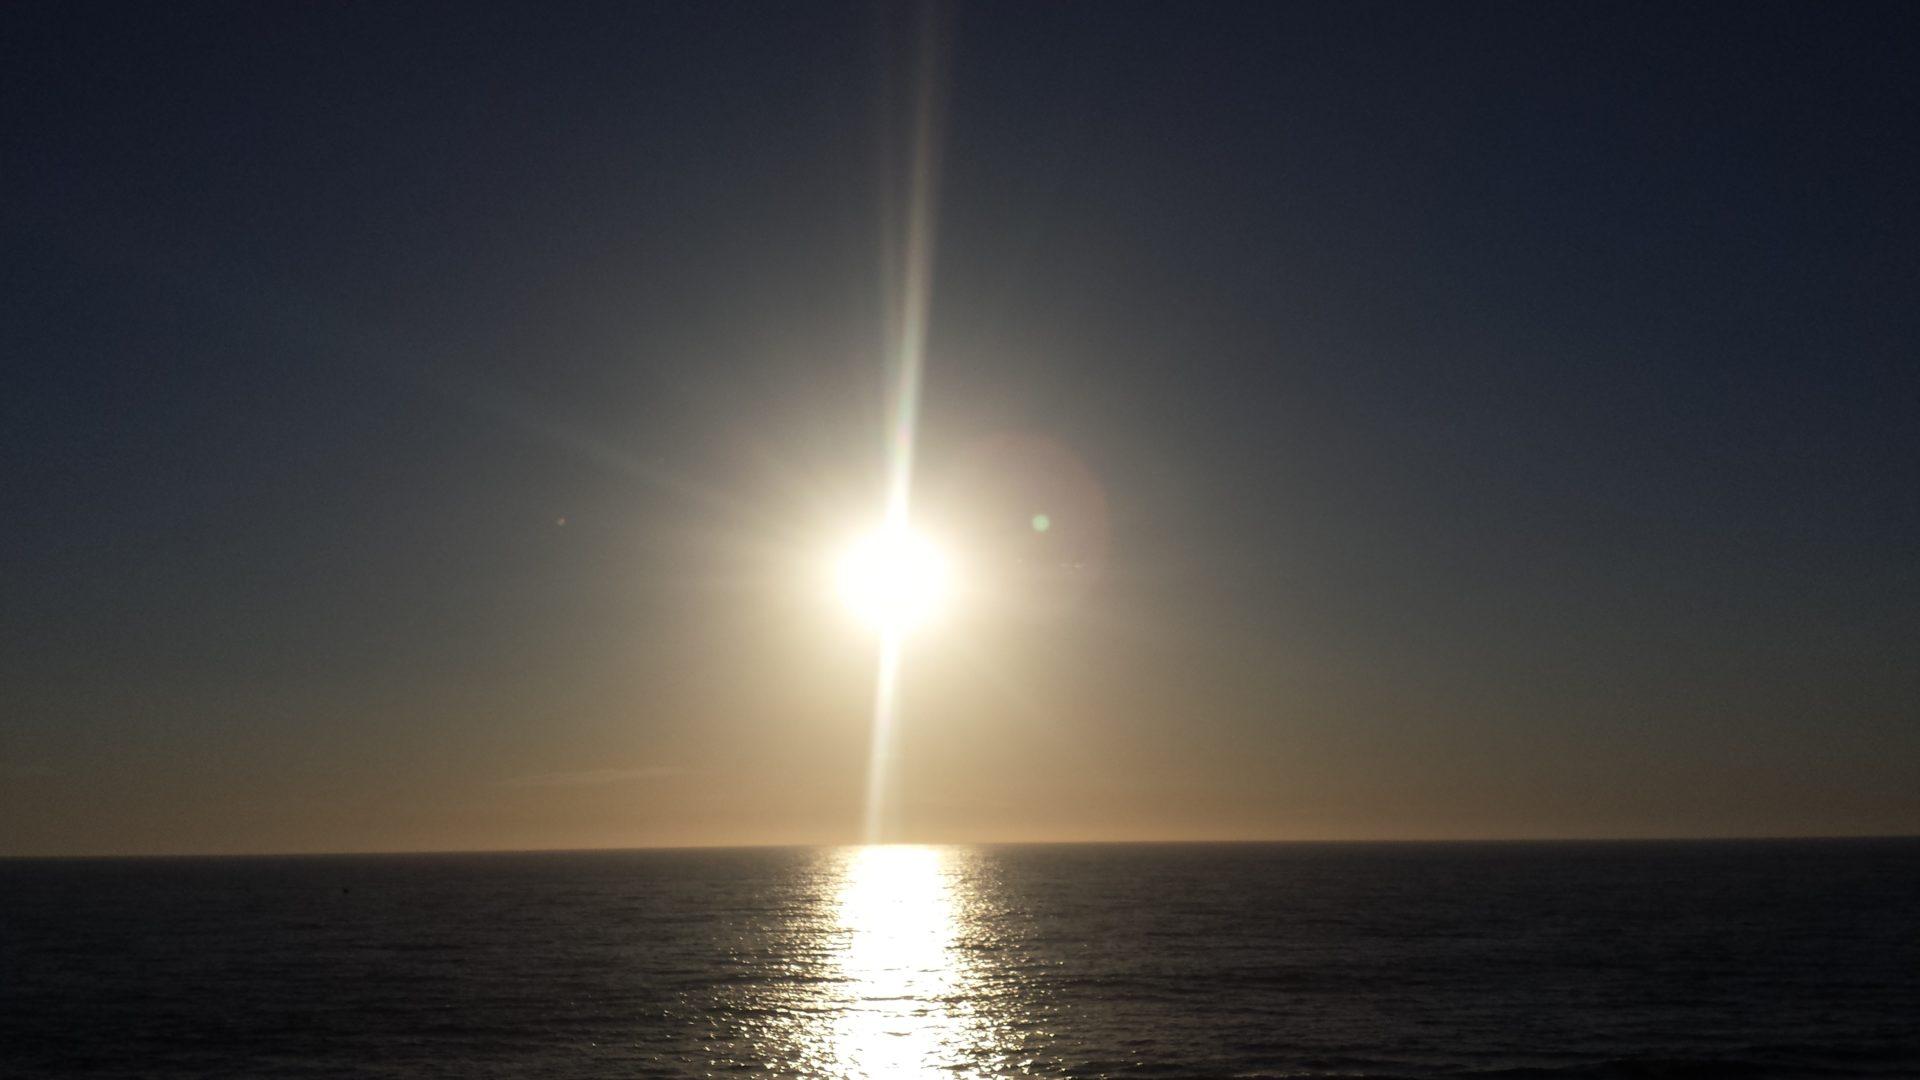 More Sunset Drama